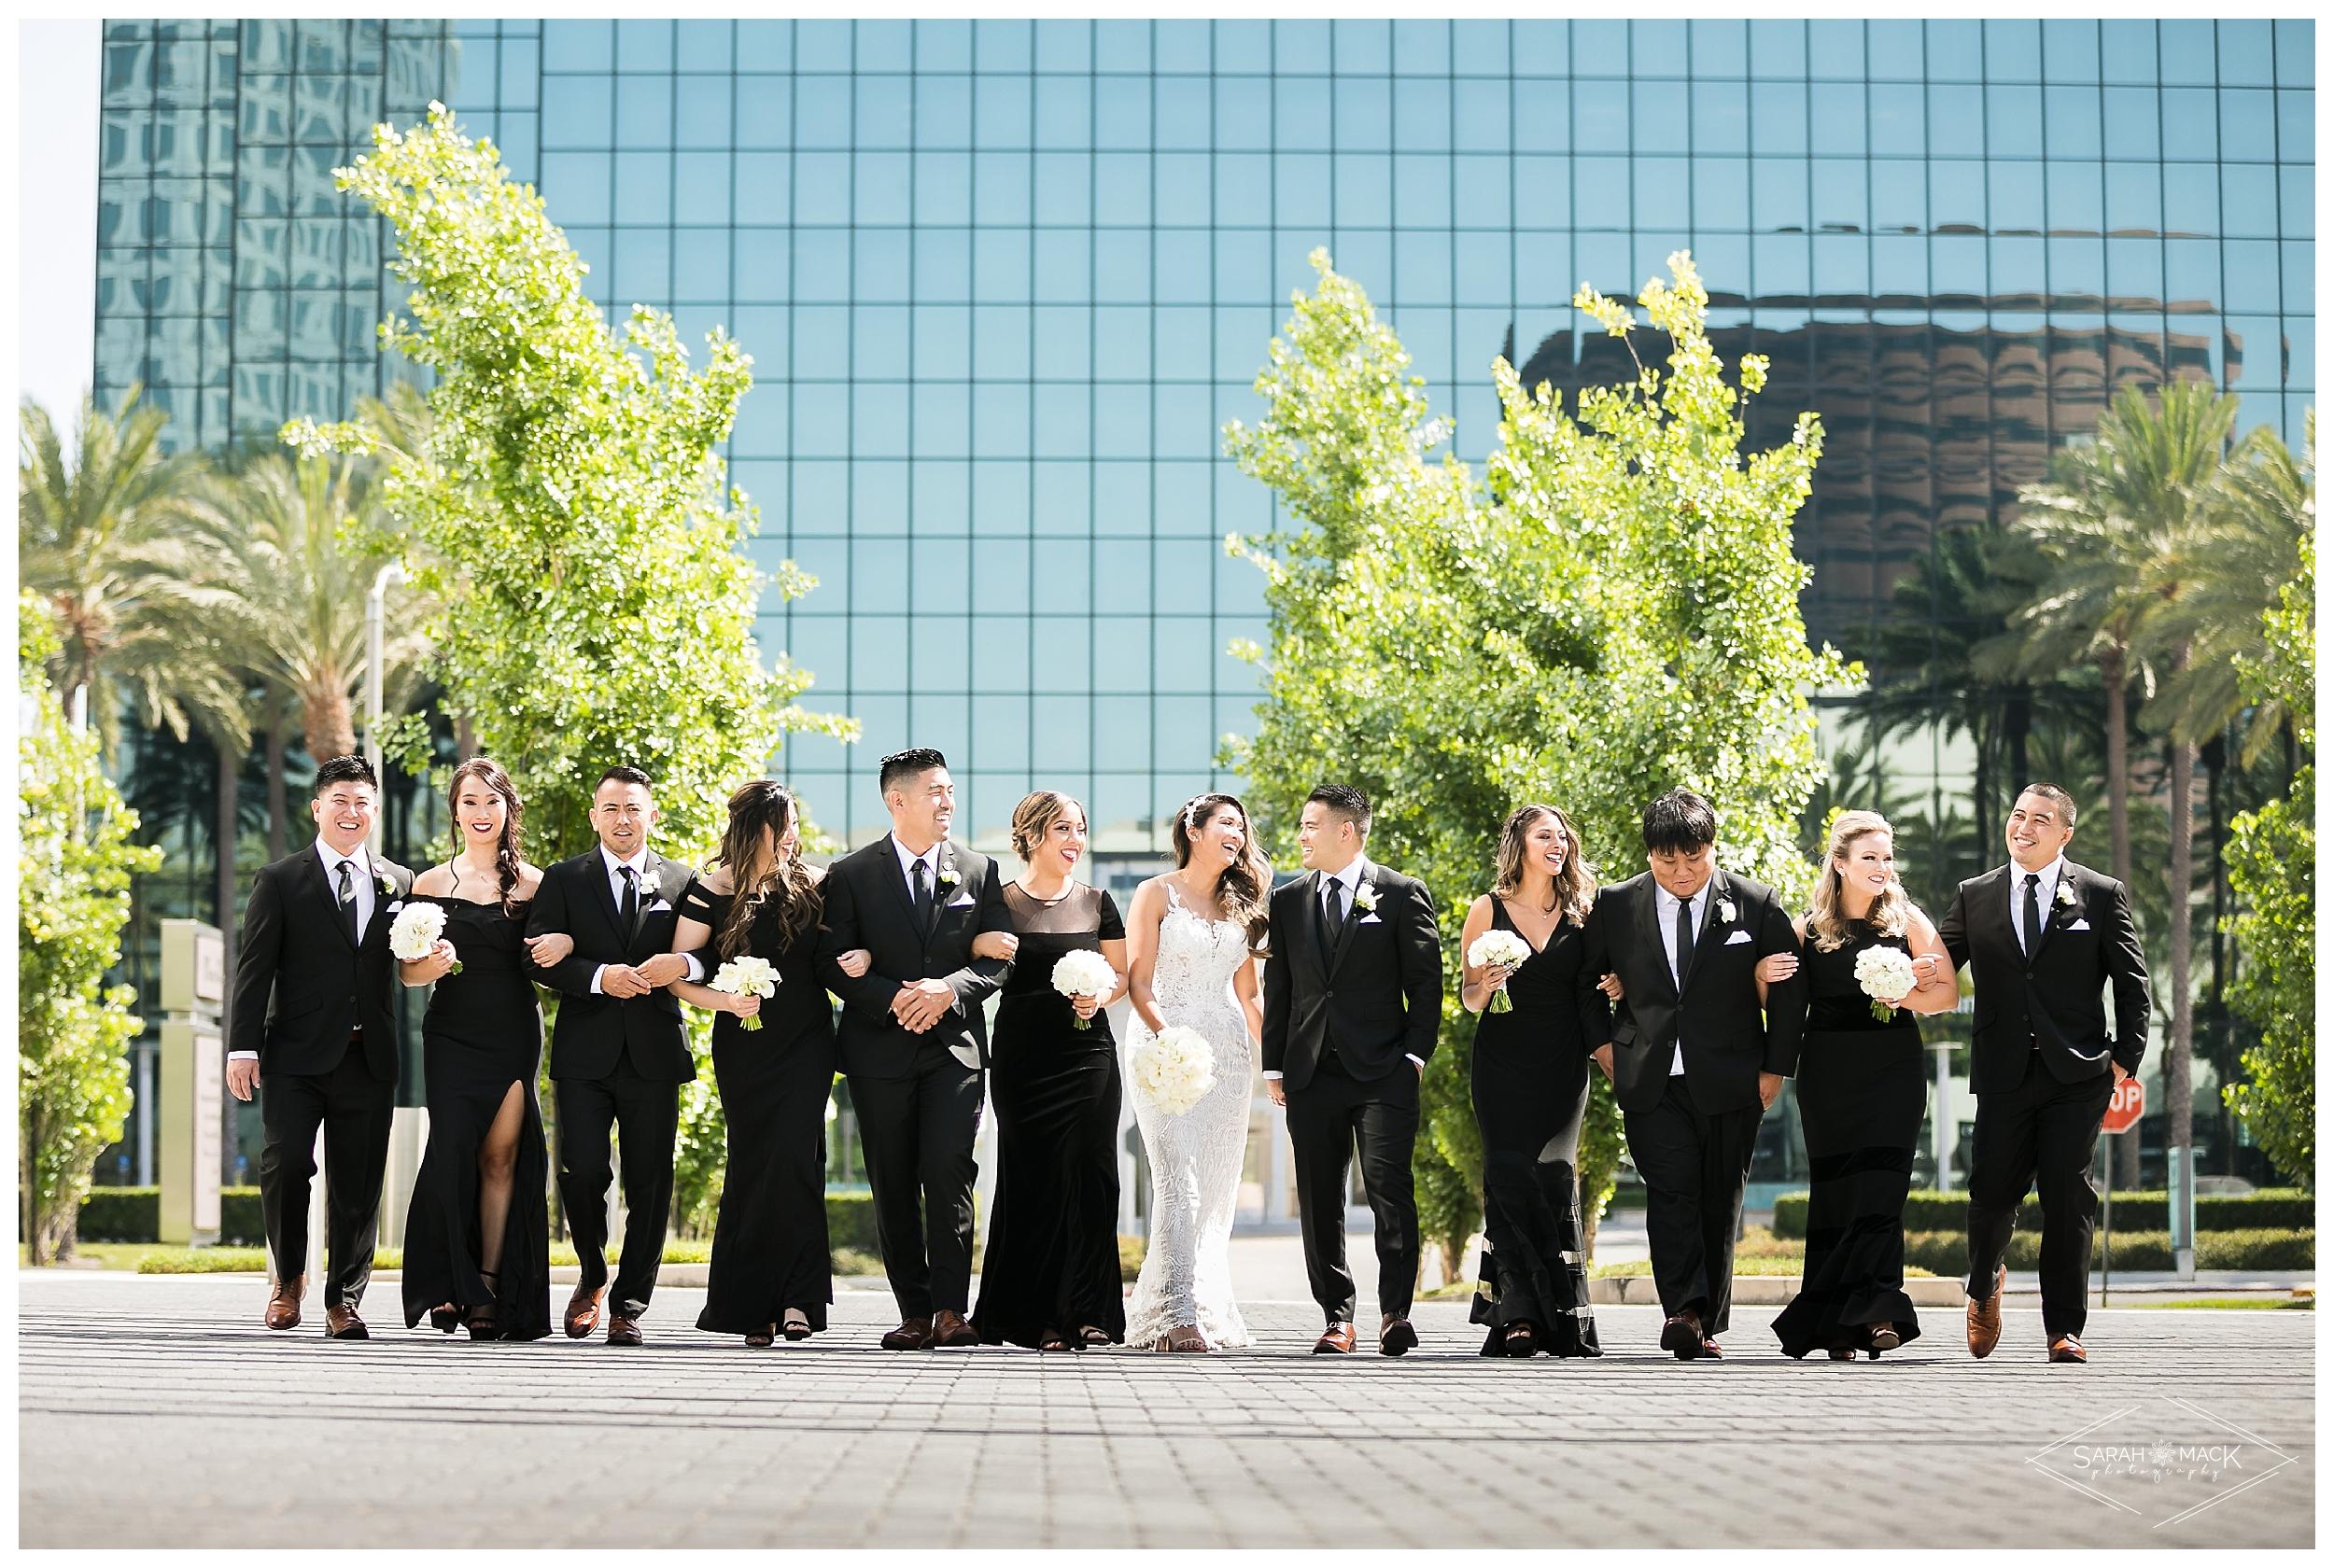 LE-Avenue-of-the-Arts-Costa-Mesa-Wedding-Photography-0091.jpg